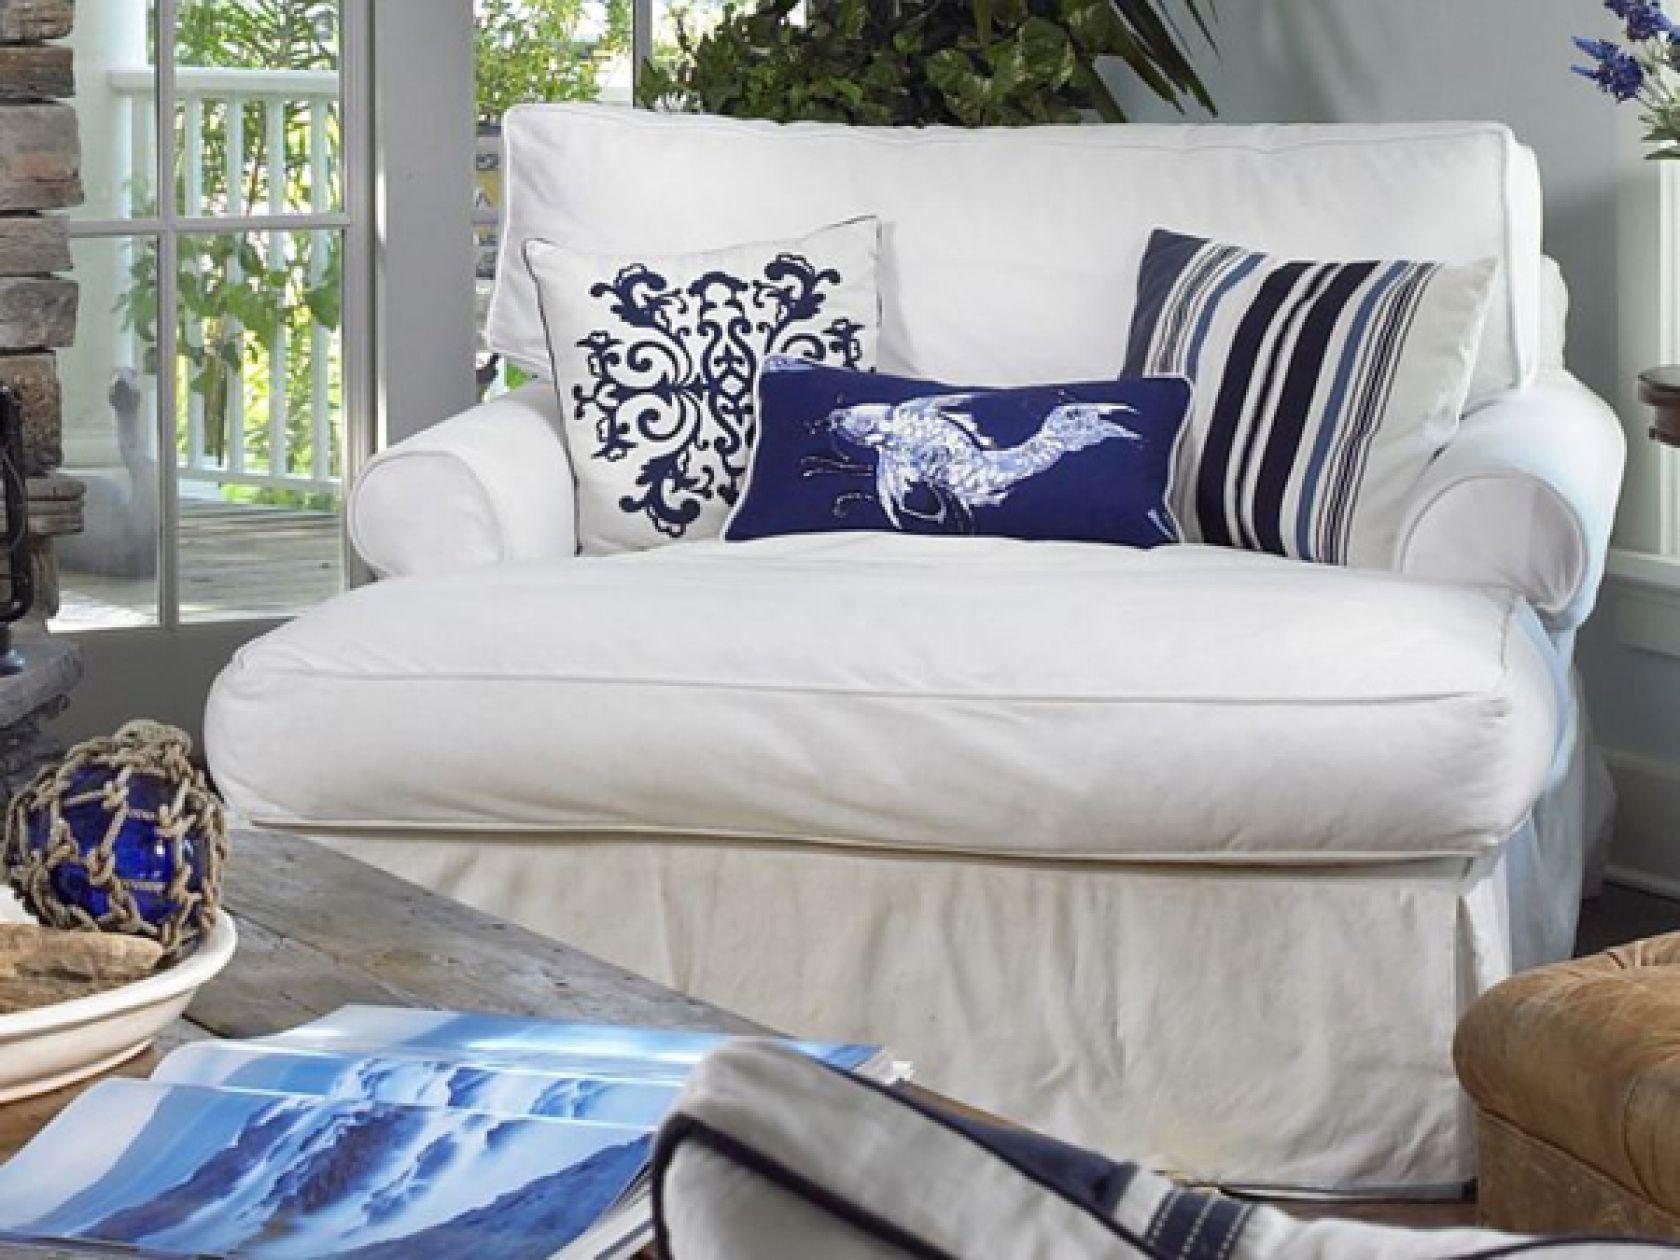 Interior Design Washable Slipcovered Sofas Washable Slipcovered For Washable Sofas (Image 5 of 20)